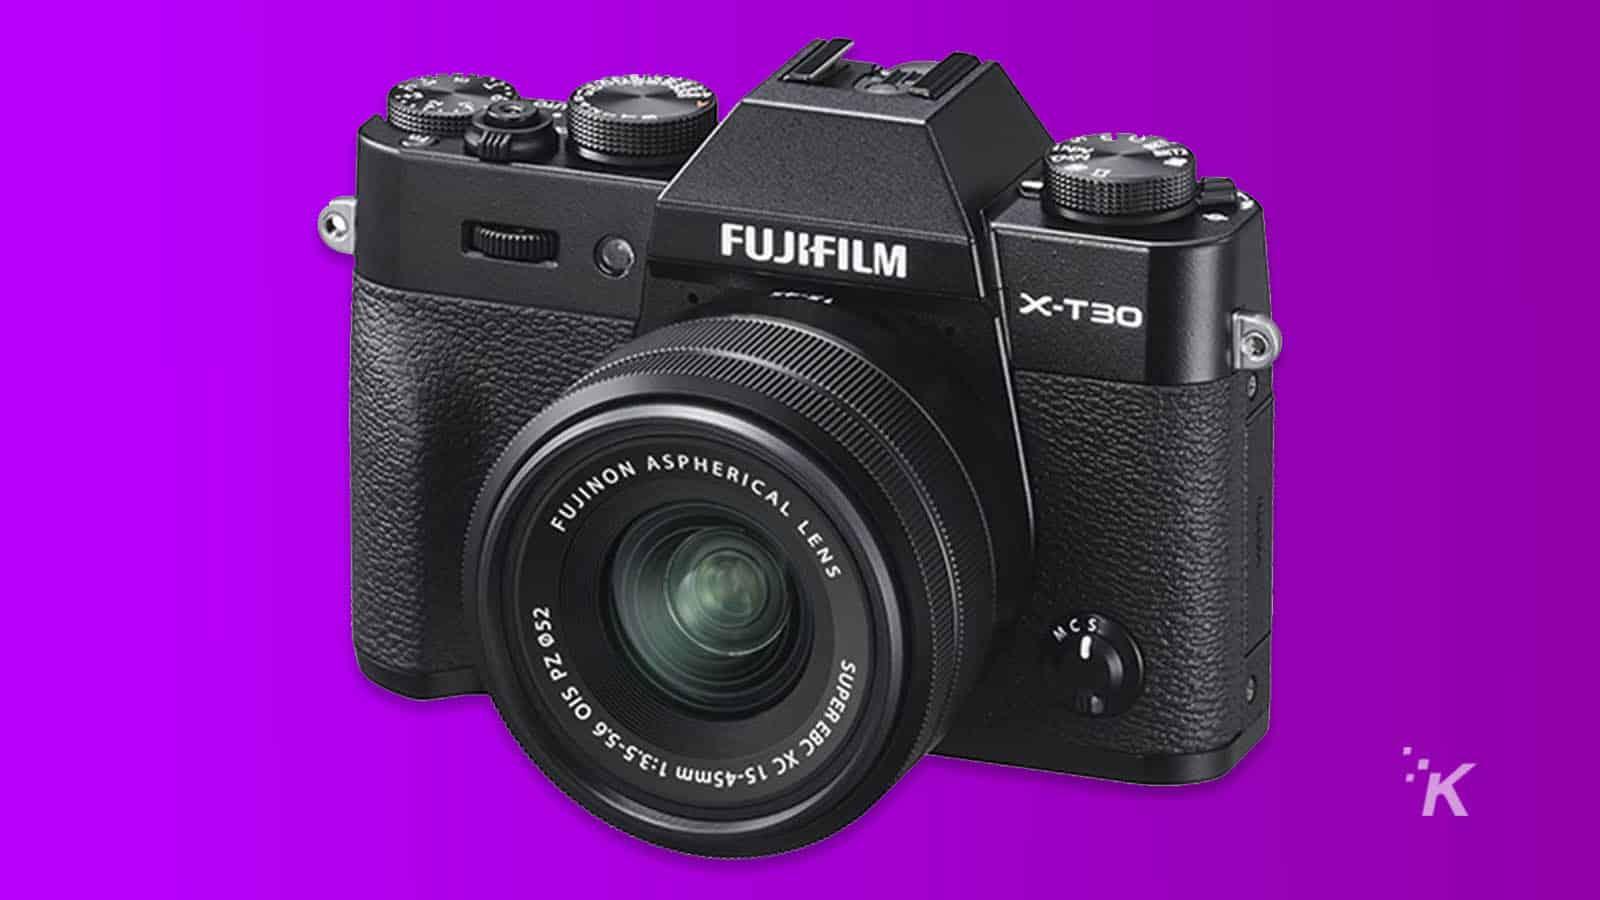 fujifilms camera